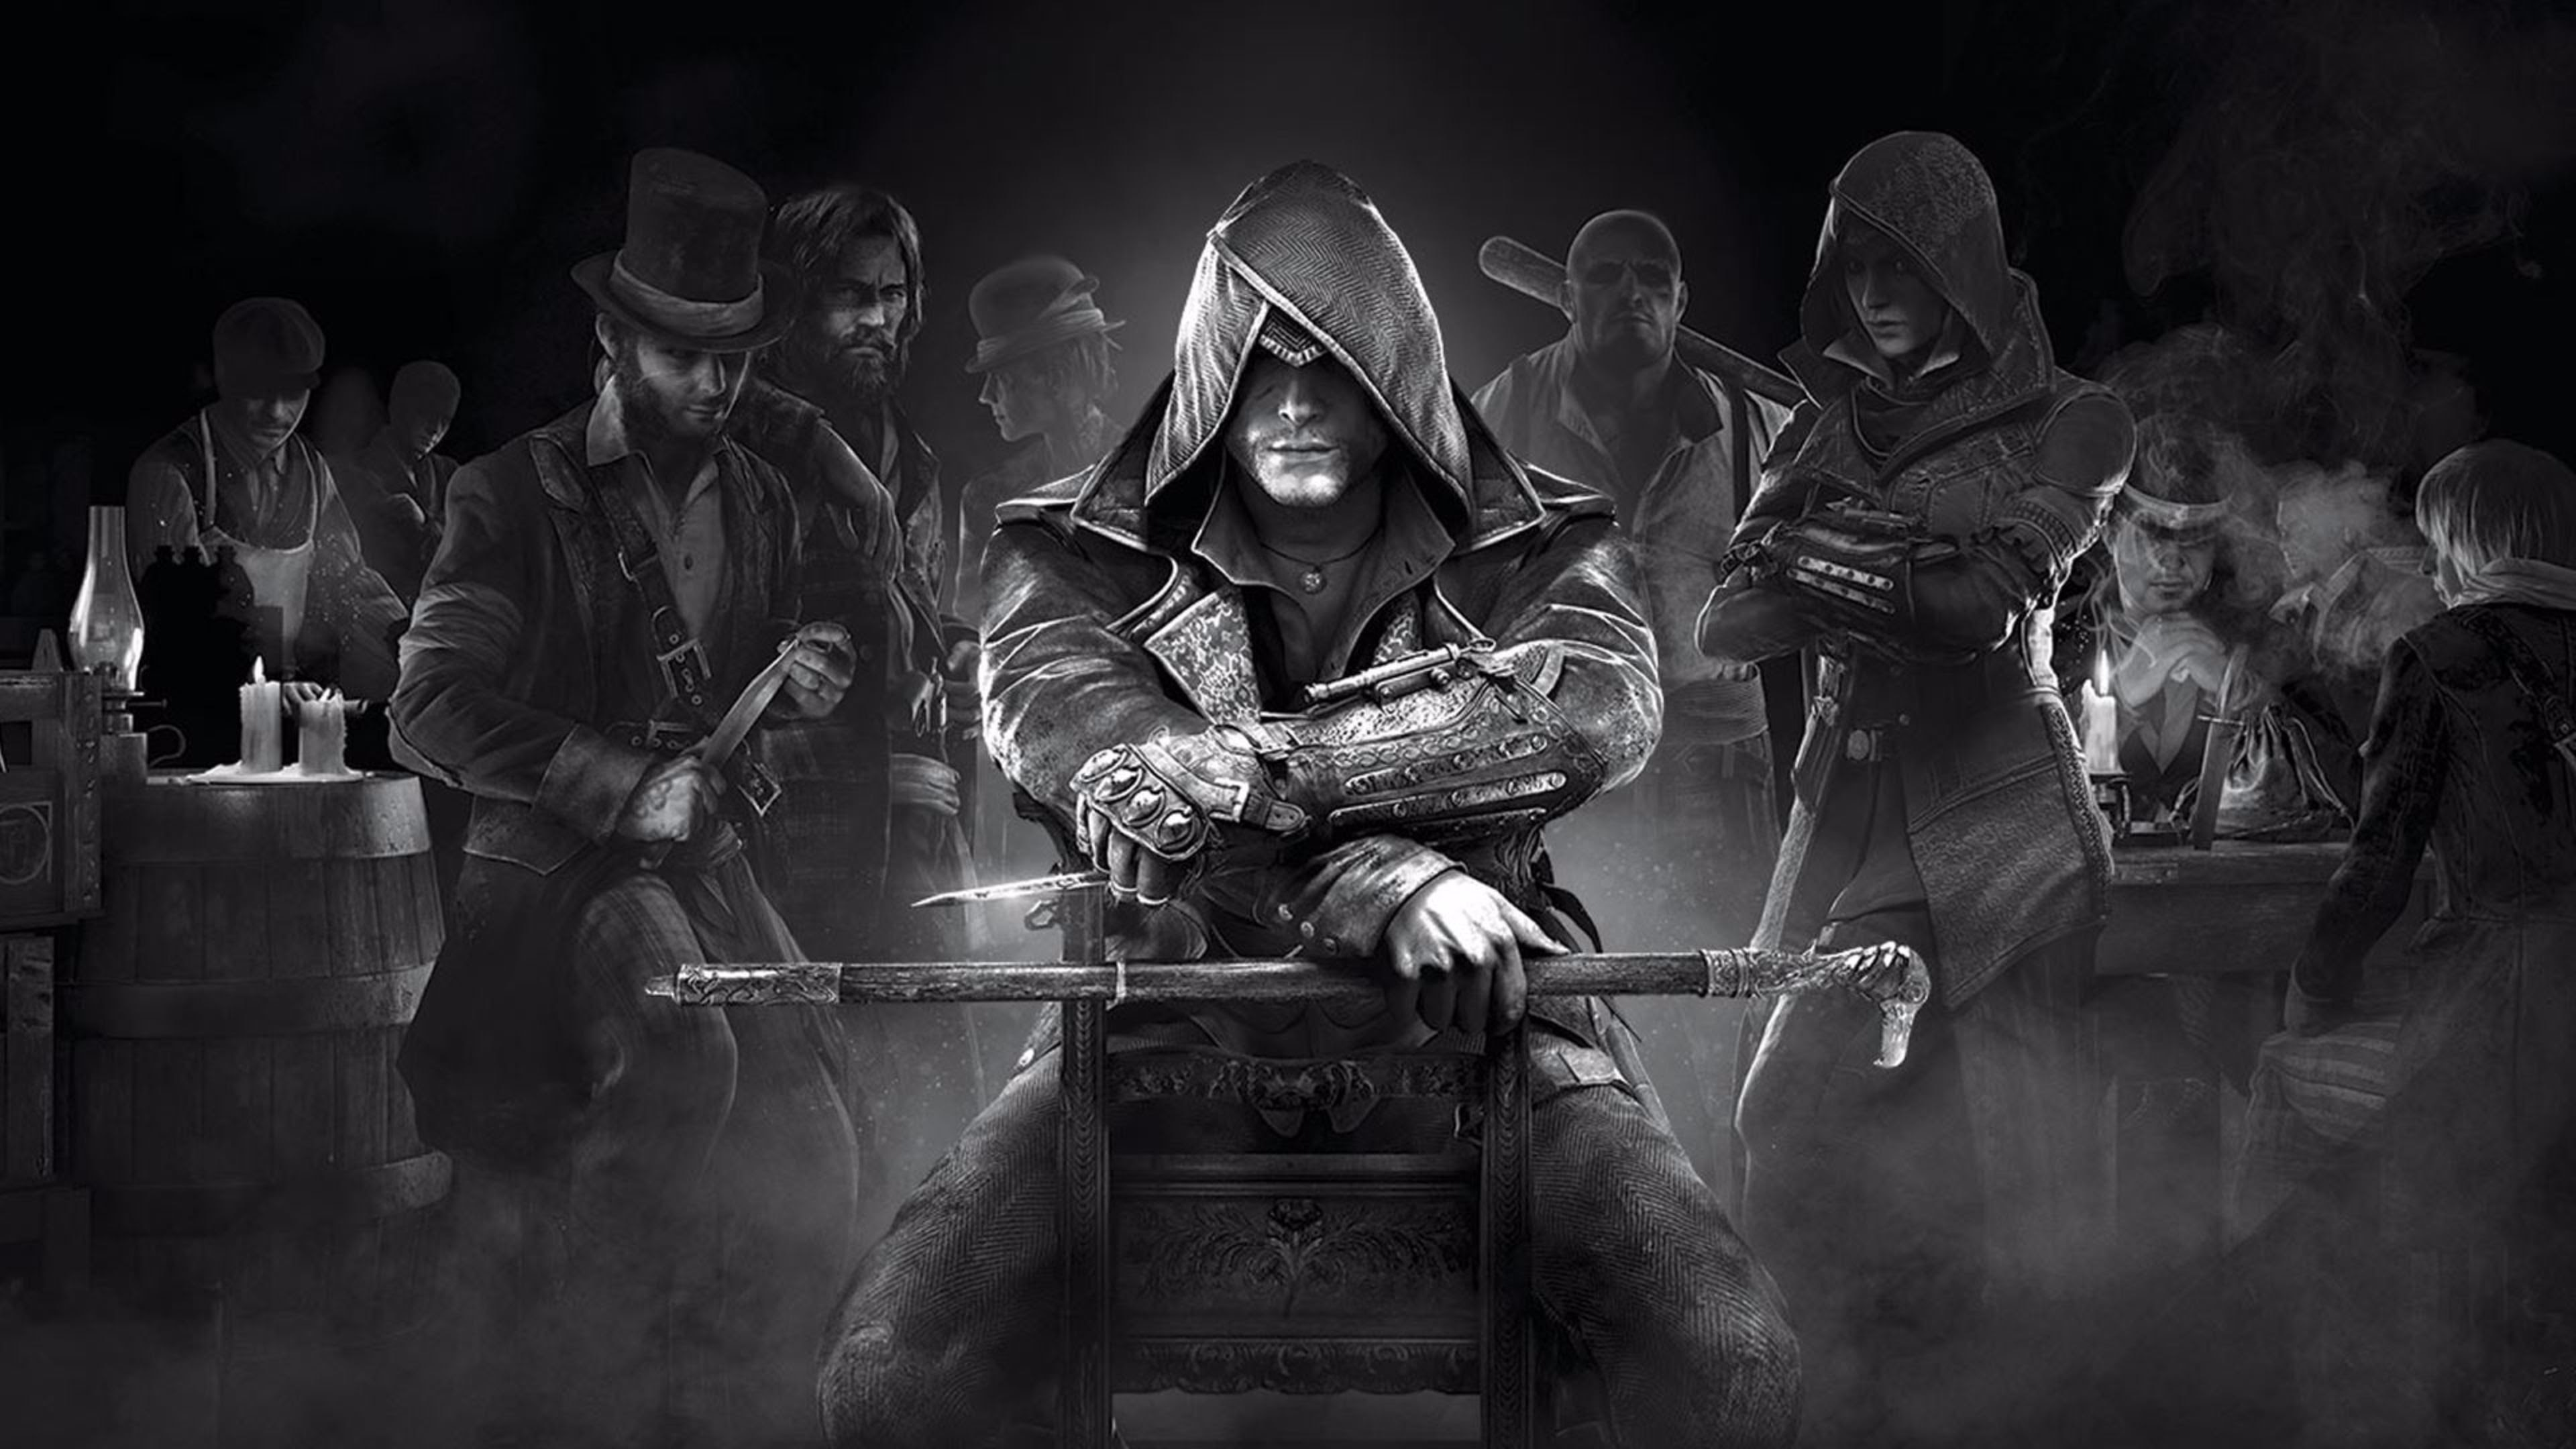 Assassins Creed Wallpaper Hd 81 Images